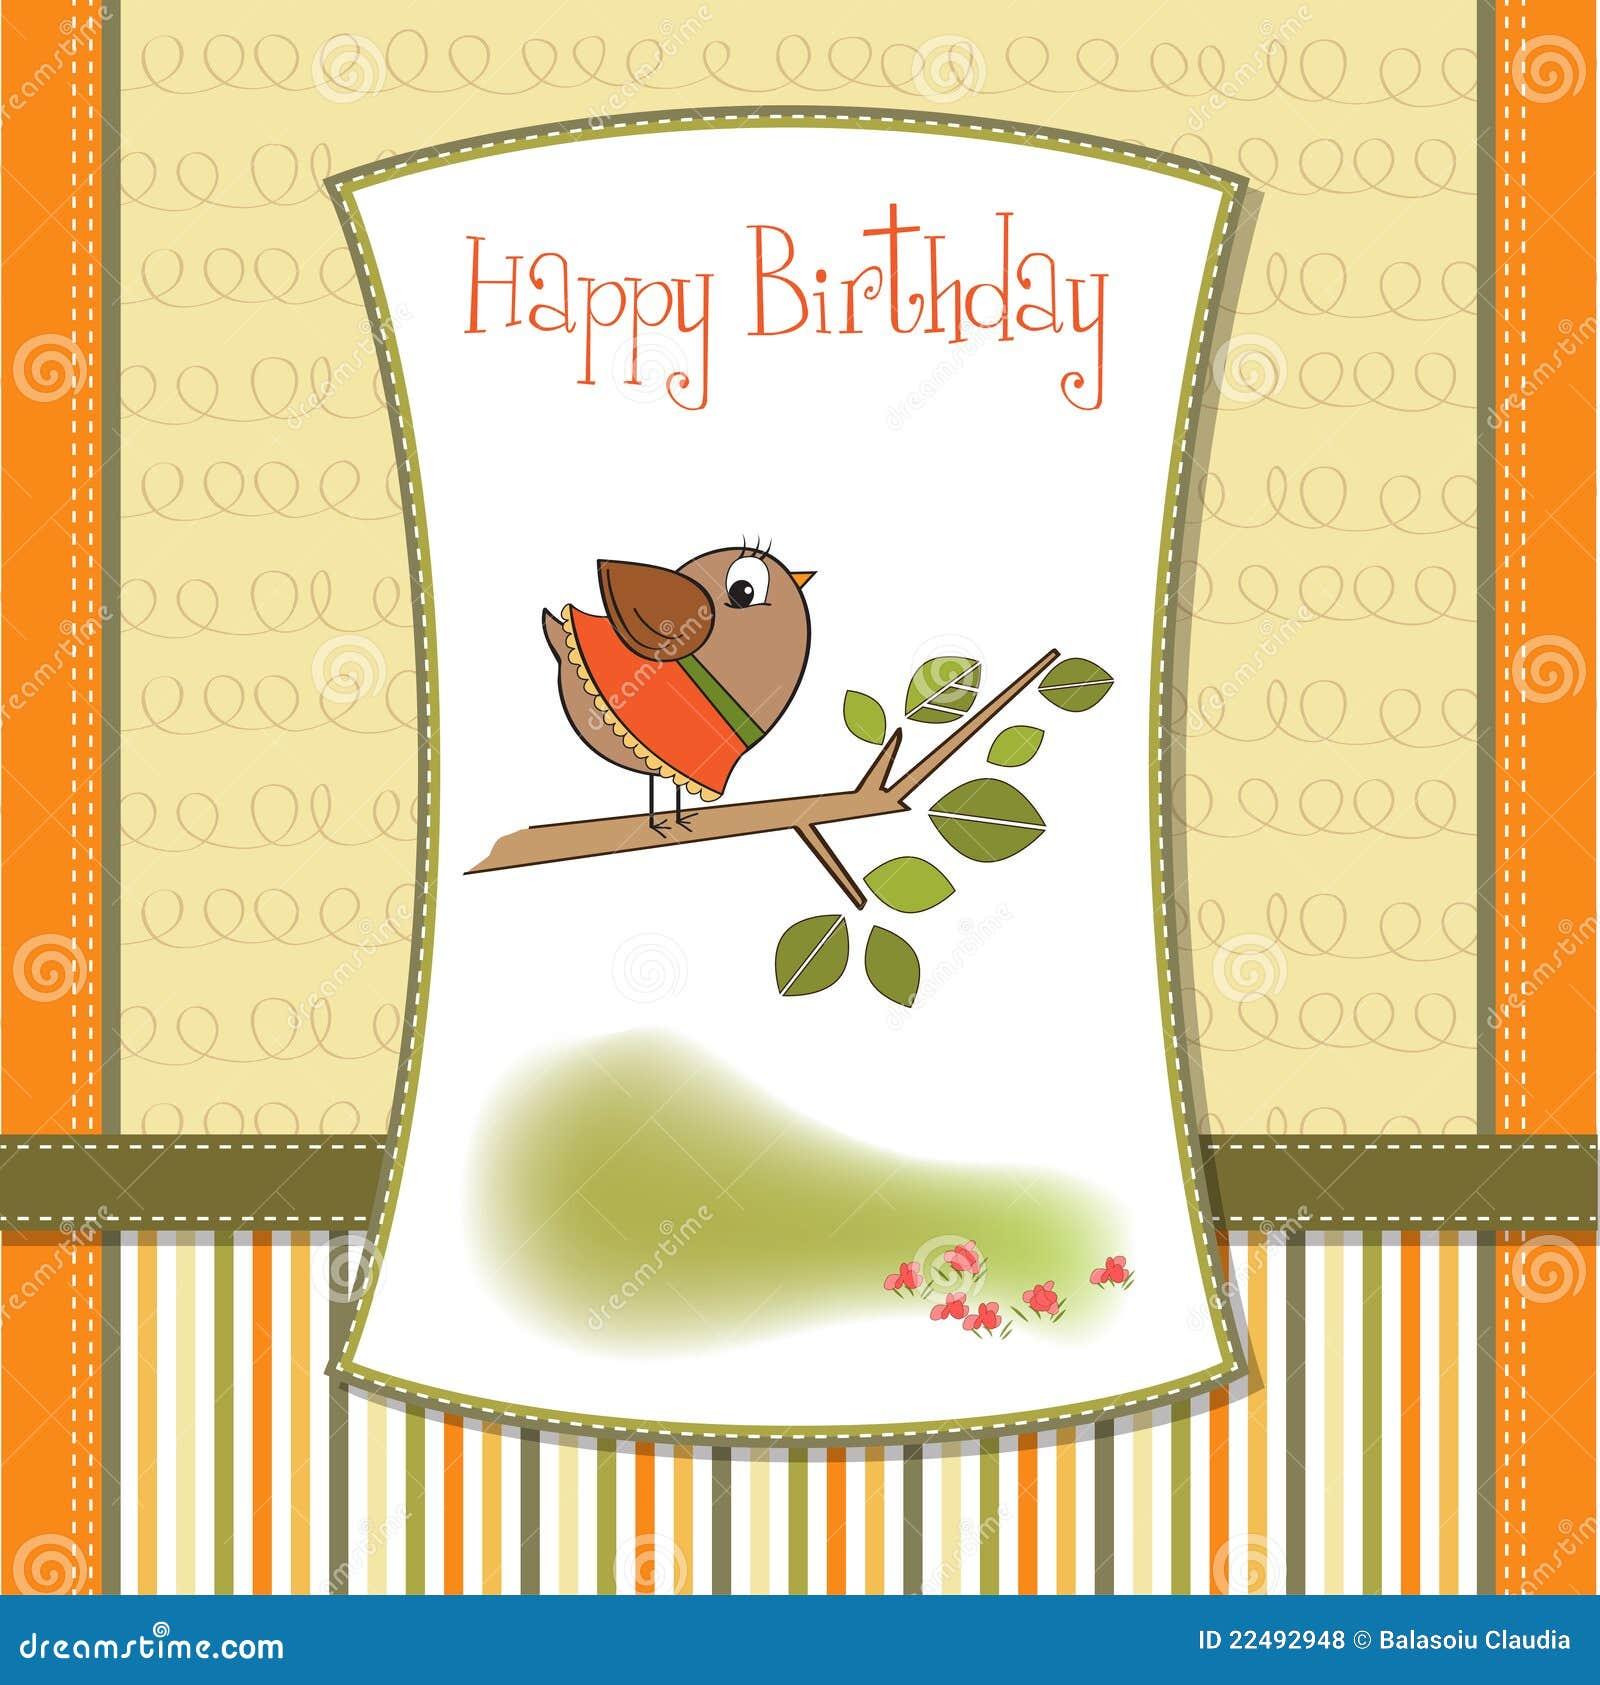 Birthday greeting card with little bird